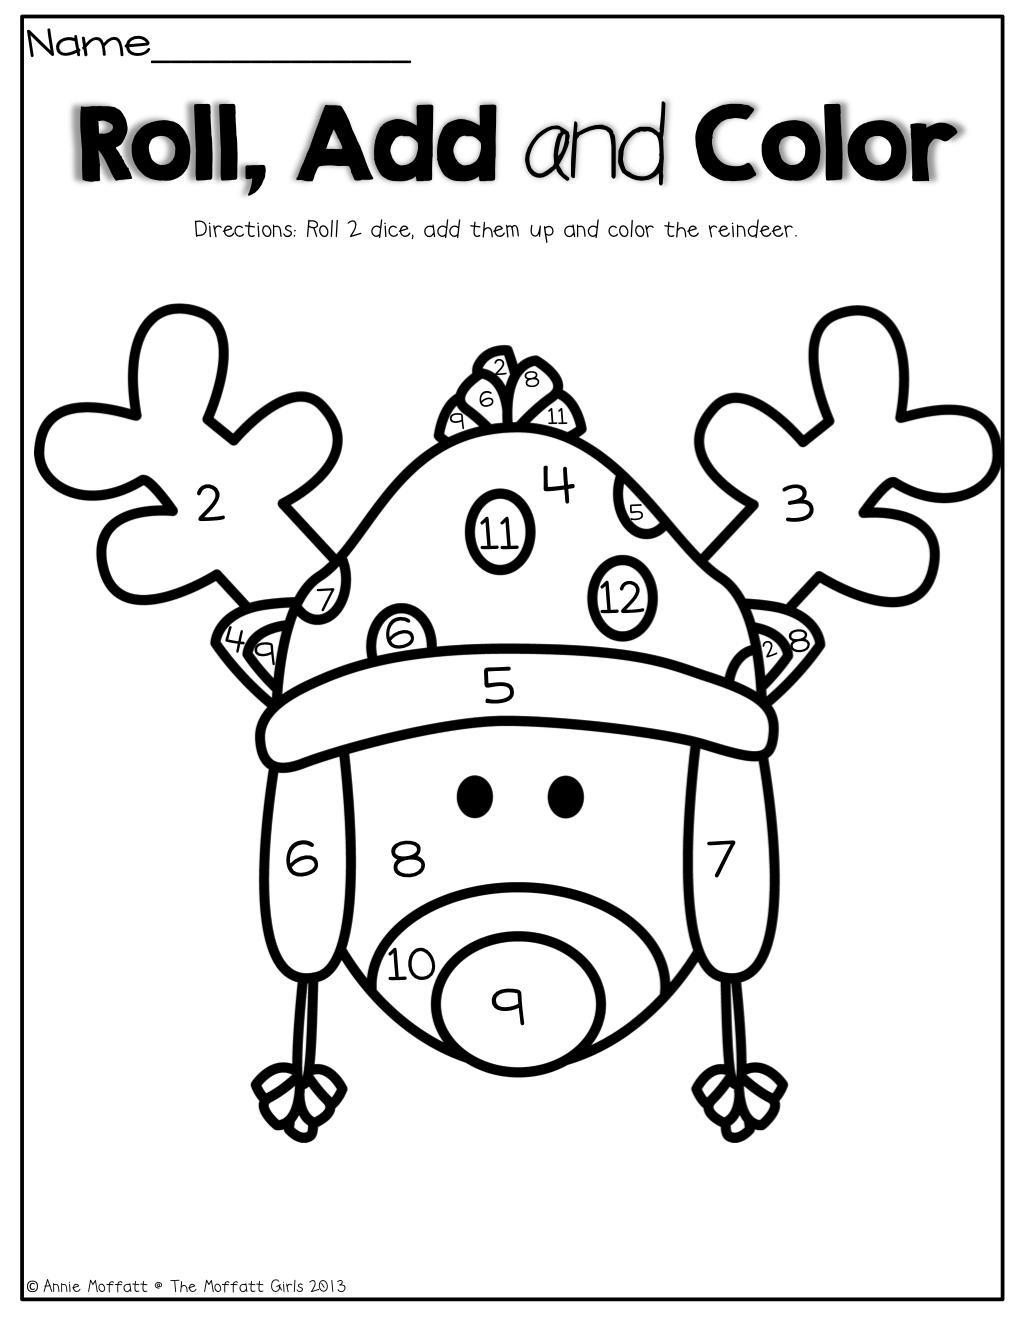 math coloring activities for kindergarten math coloring pages kindergarten coloring pages activities coloring math kindergarten for